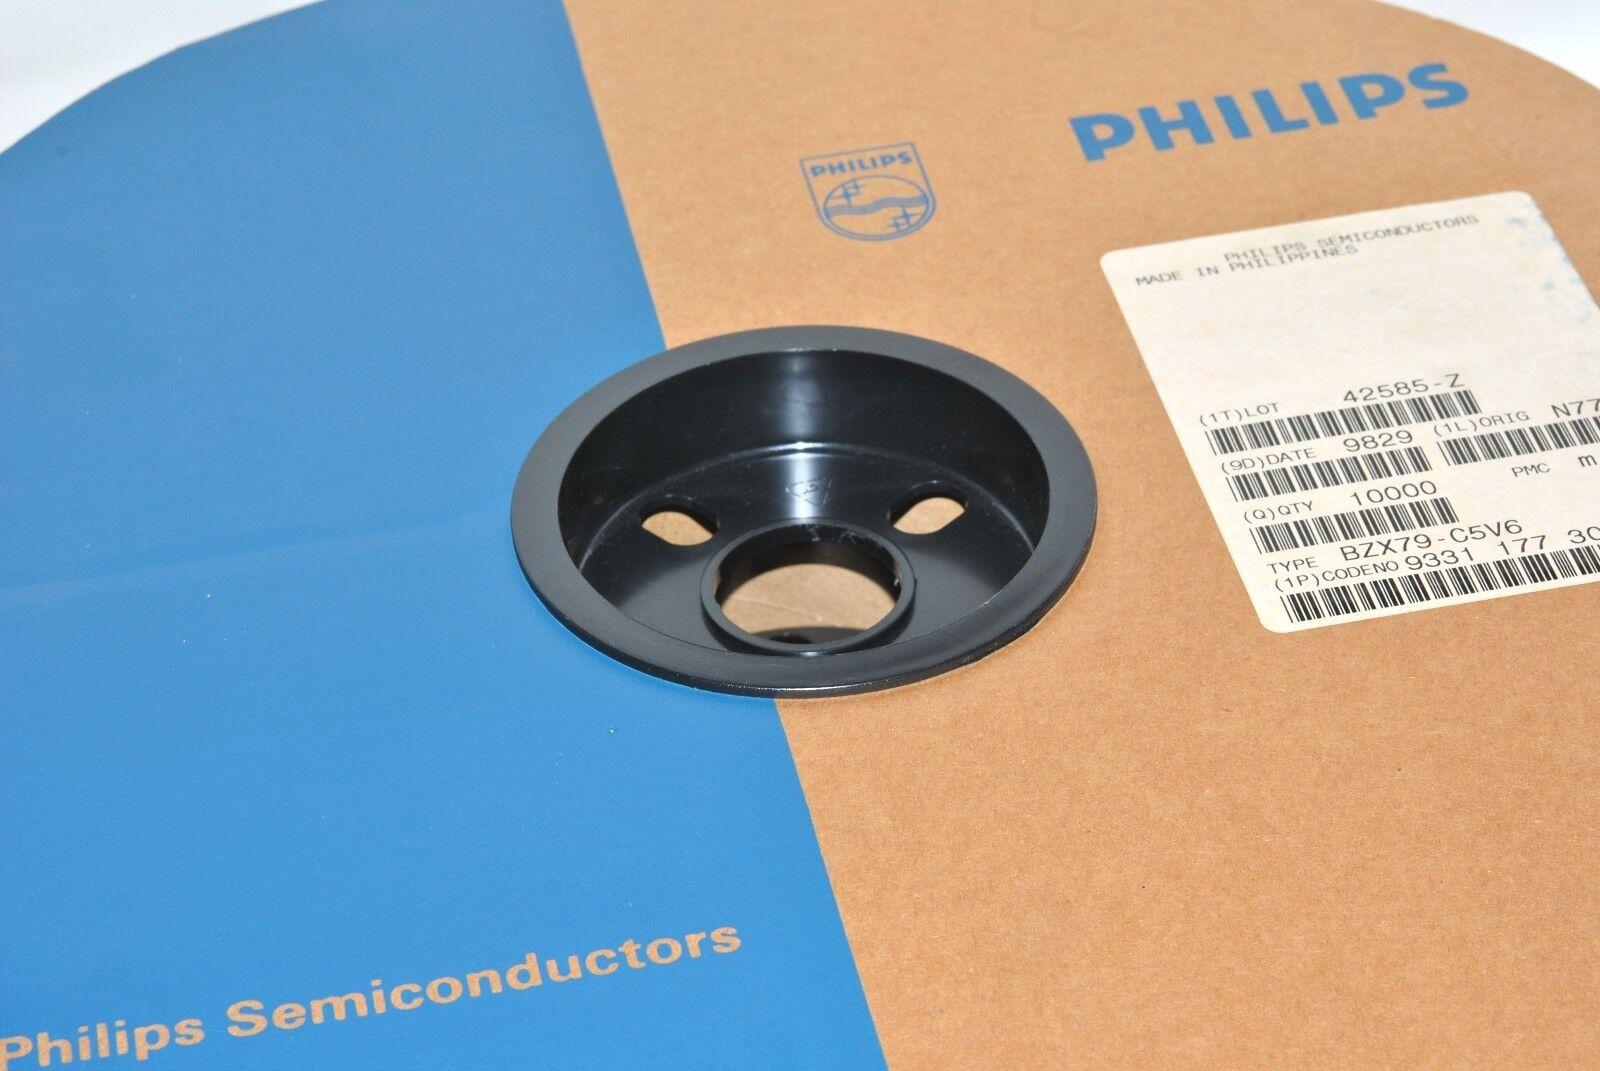 10 x bzx79-b30 silicon Zener-diodo Philips do-35 10pcs